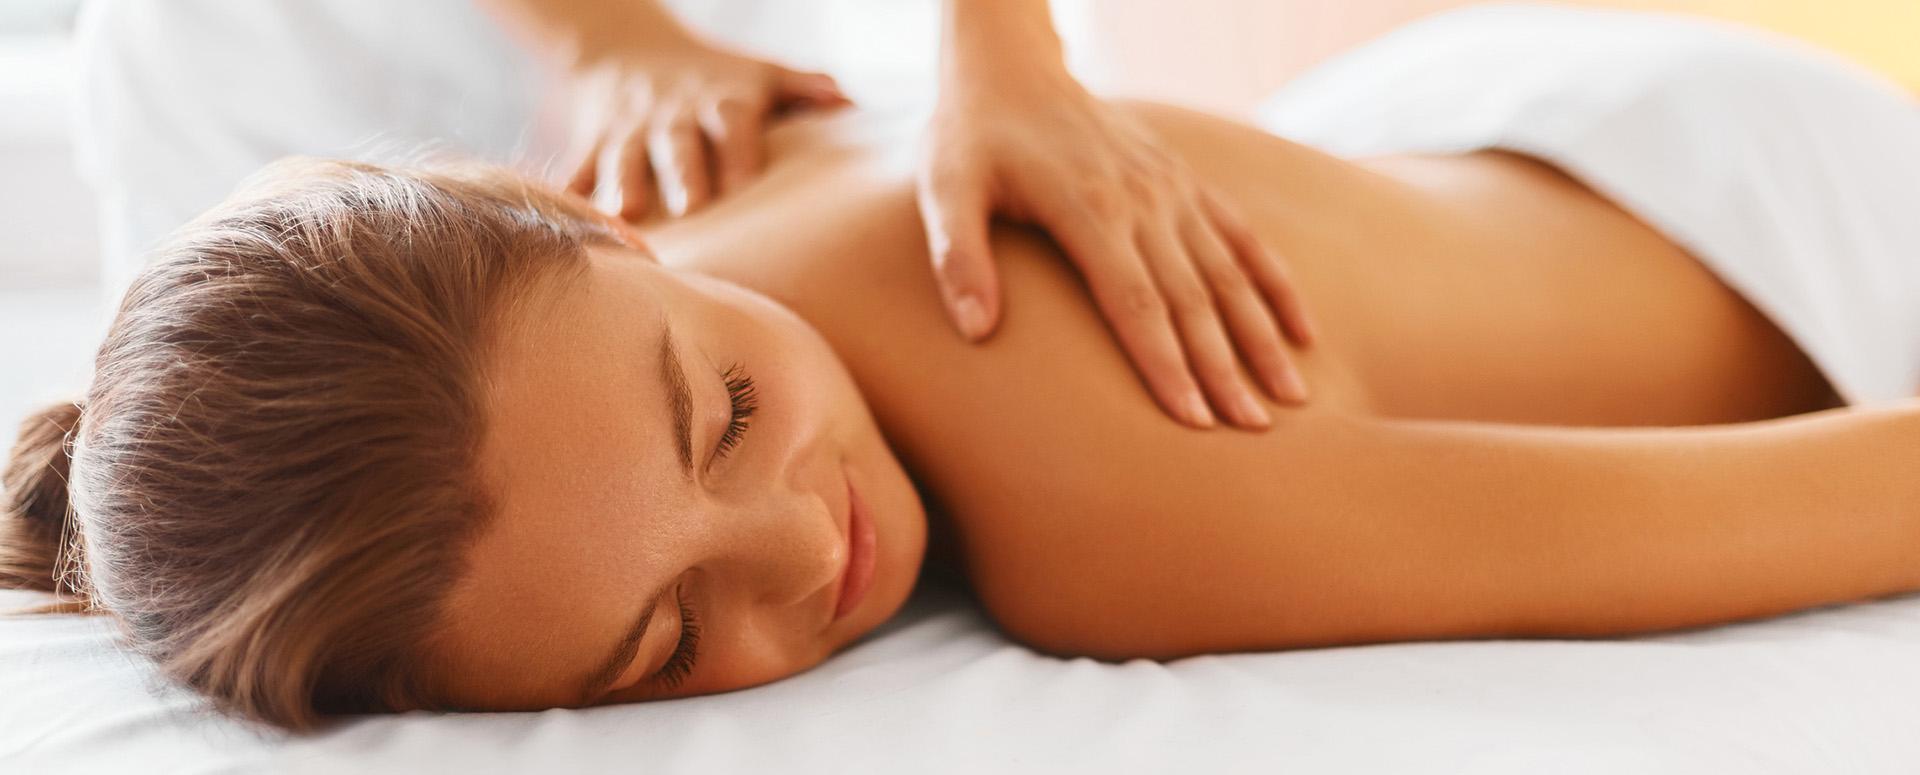 Beste Freunde Ehefrau Massage